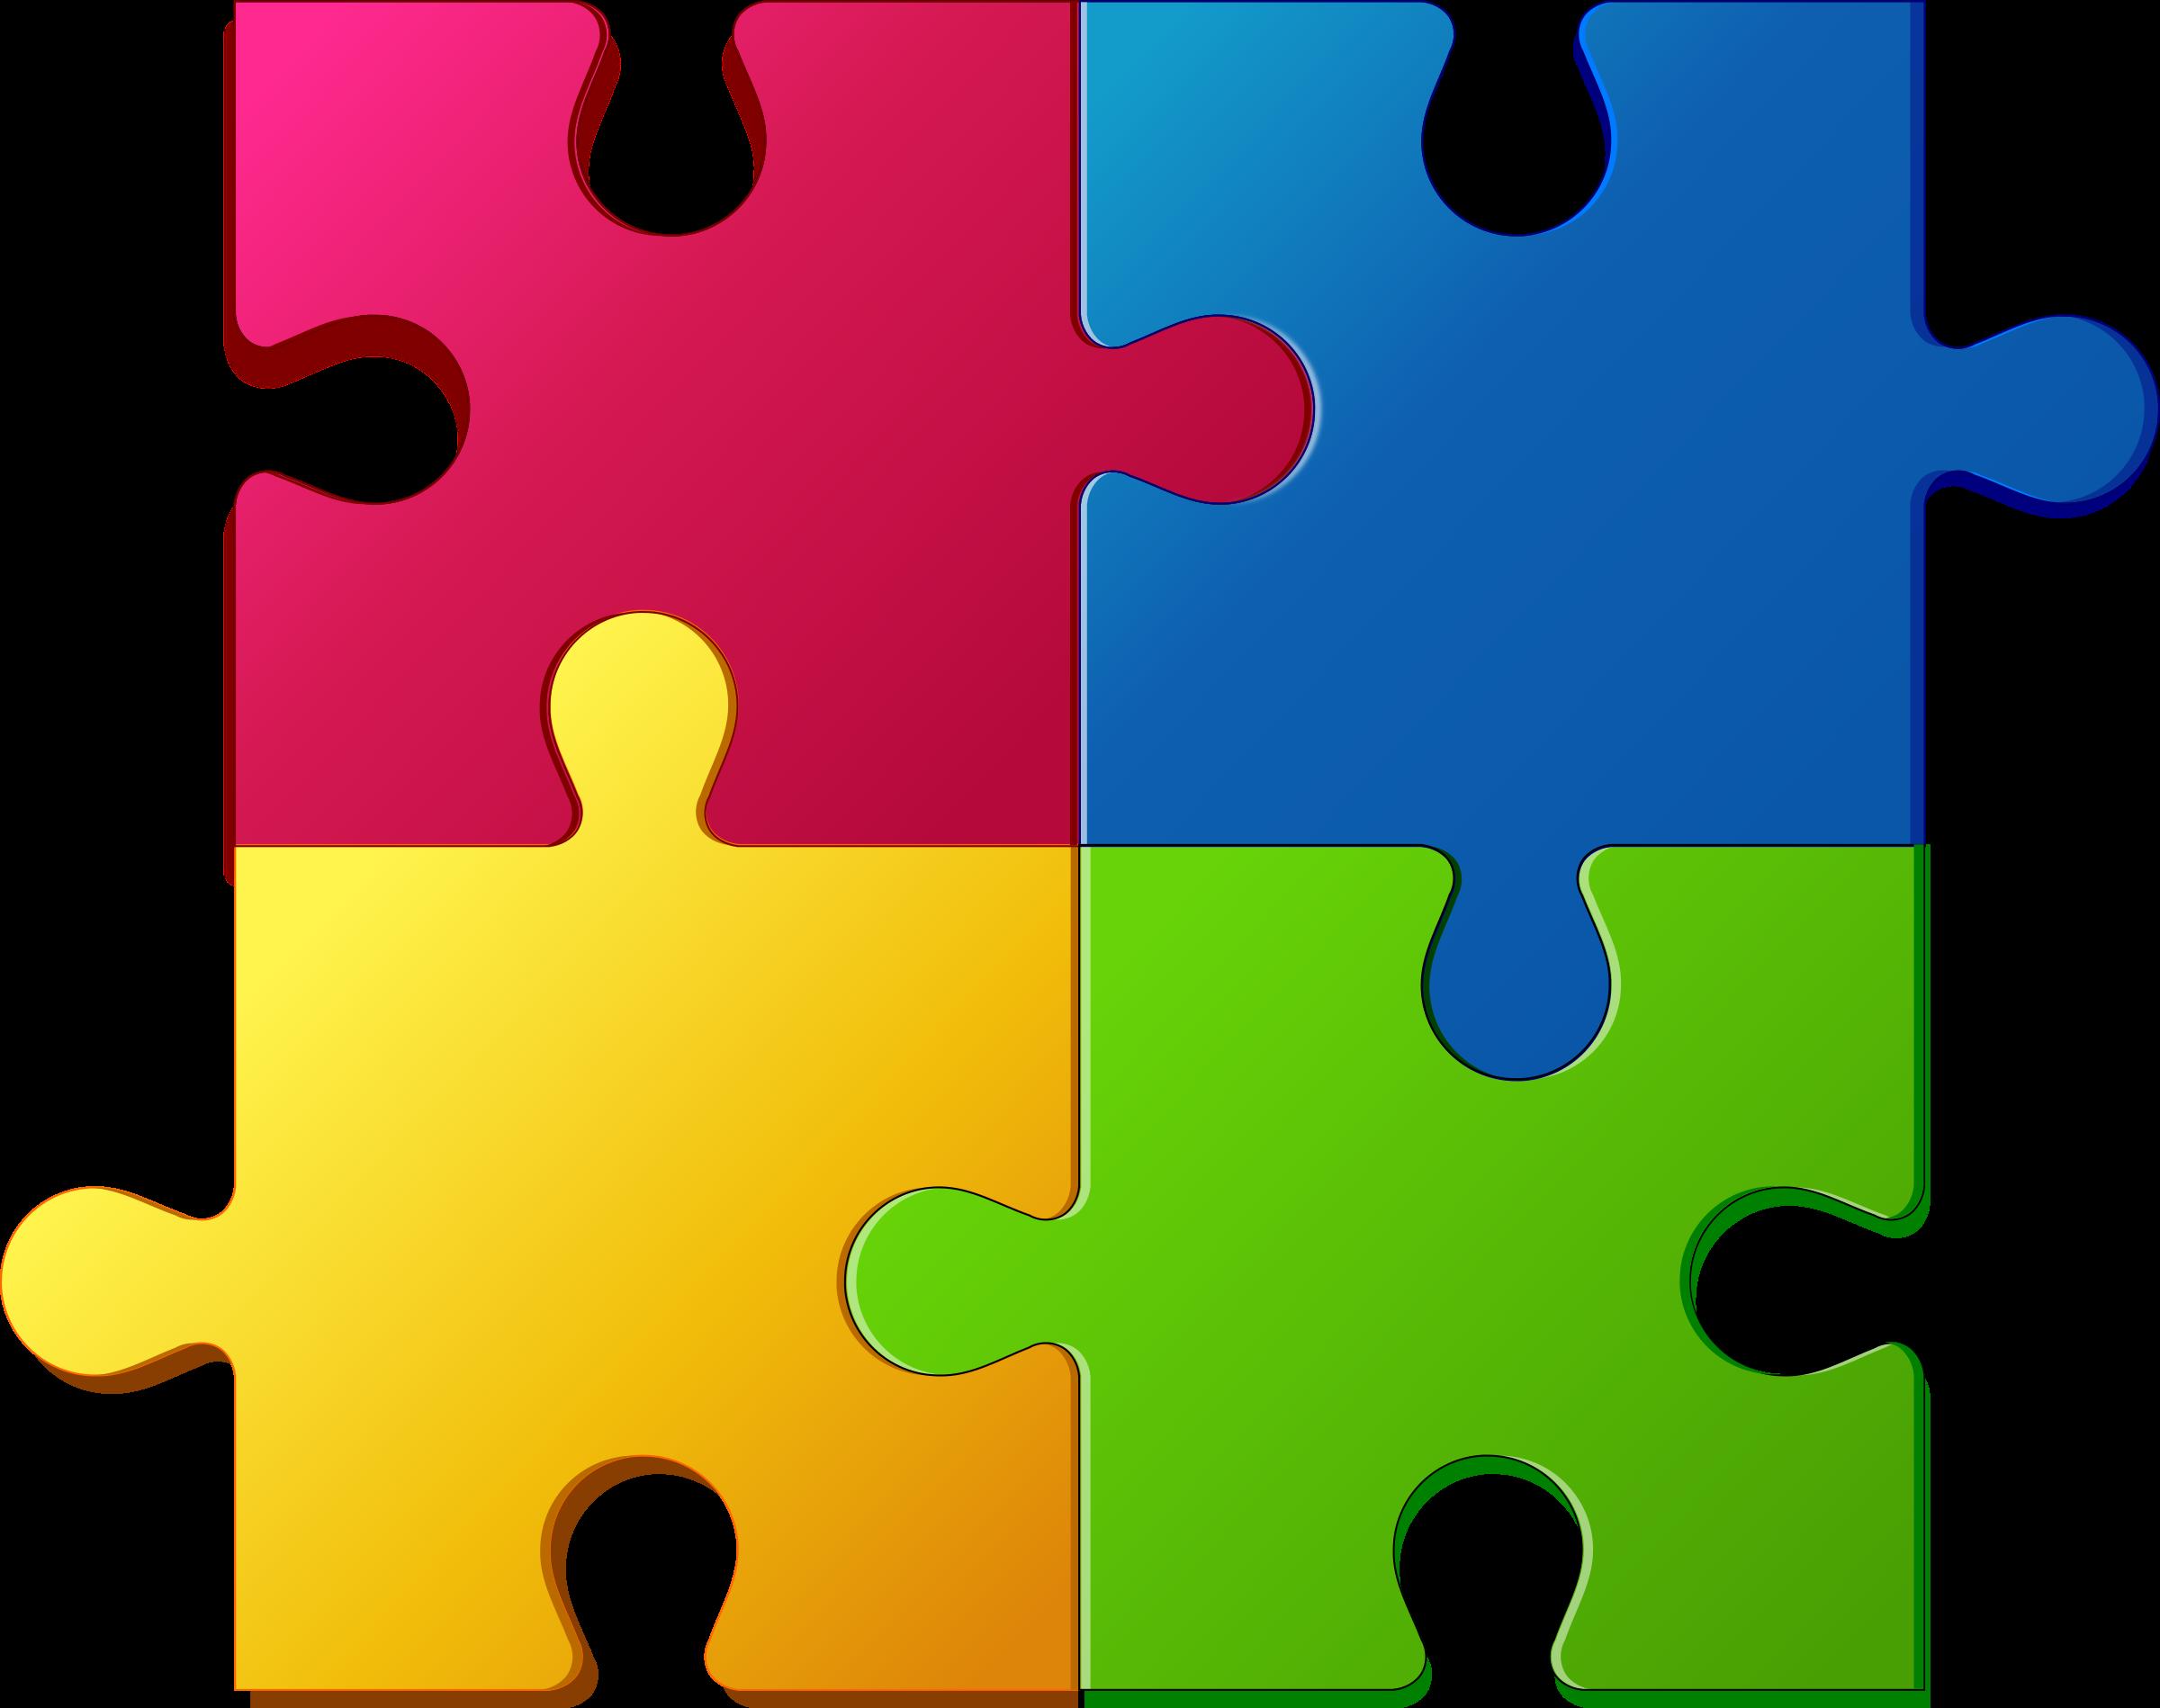 Jigsaw Puzzle By Voyeg3r Autism Puzzle Piece Puzzle Pieces Puzzle Piece Template